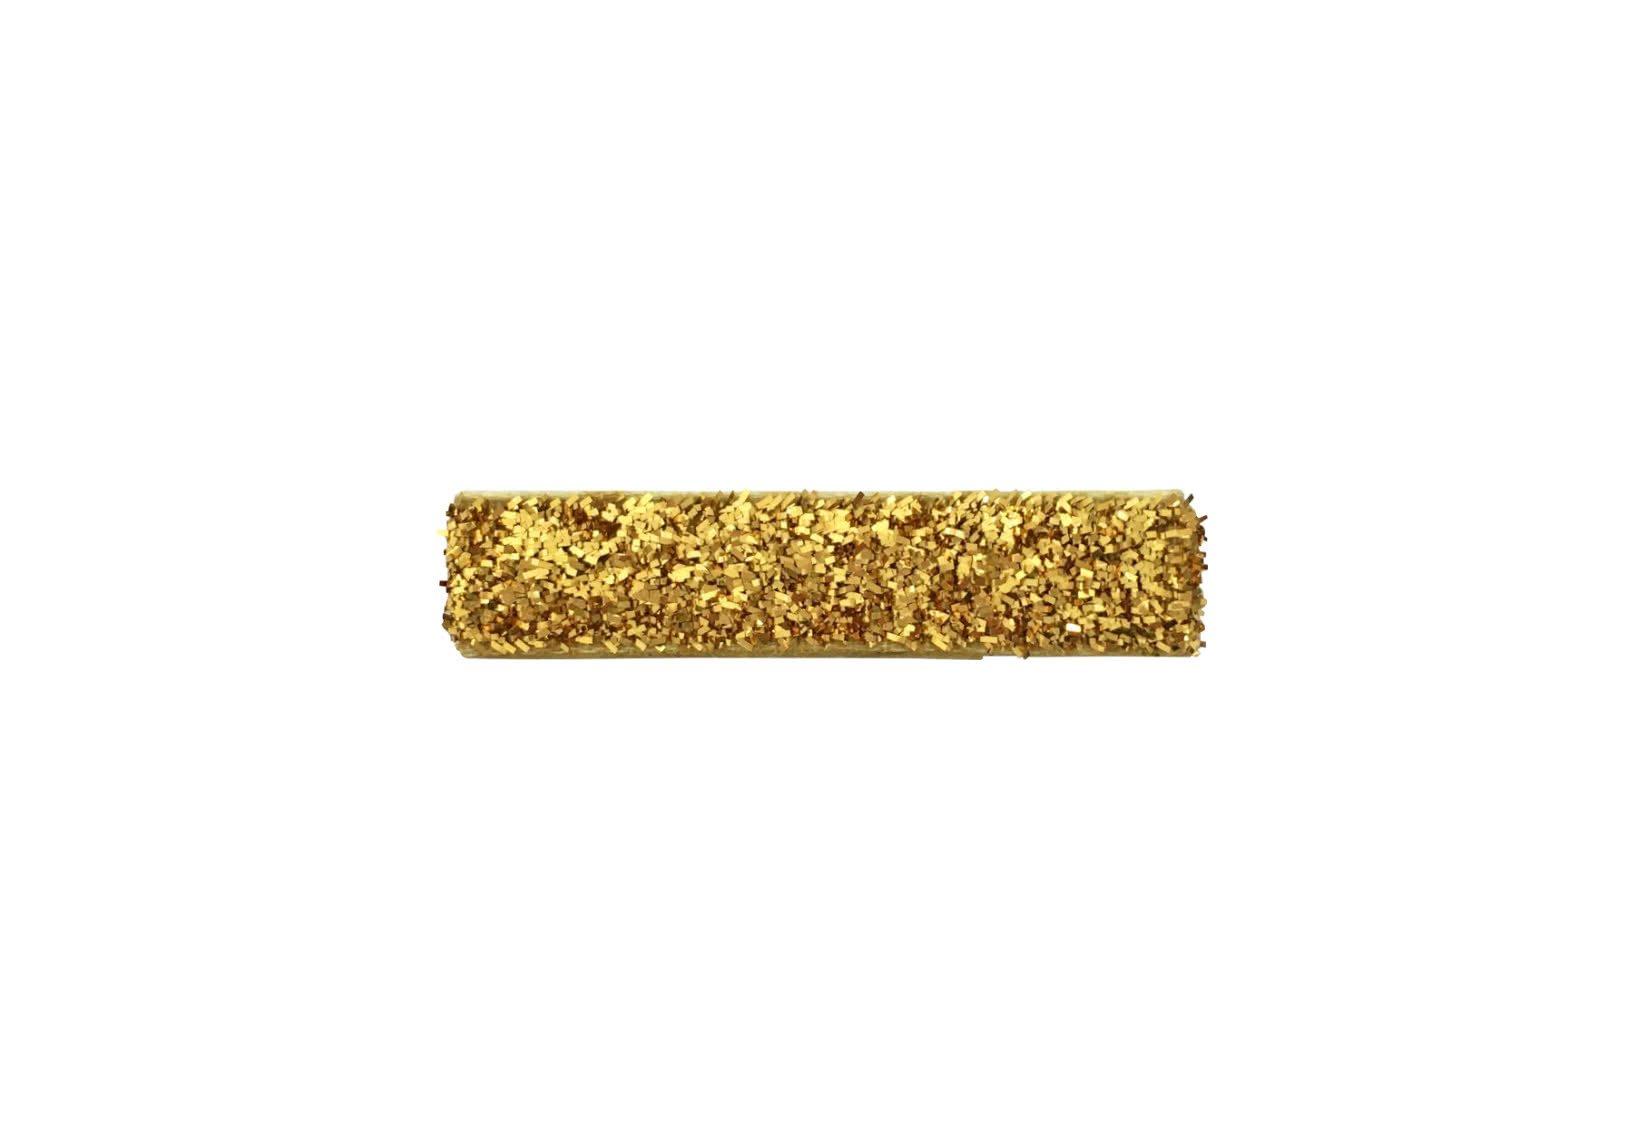 Small Gold Glitter Covered Alligator Clip – Gold Glitter Collection